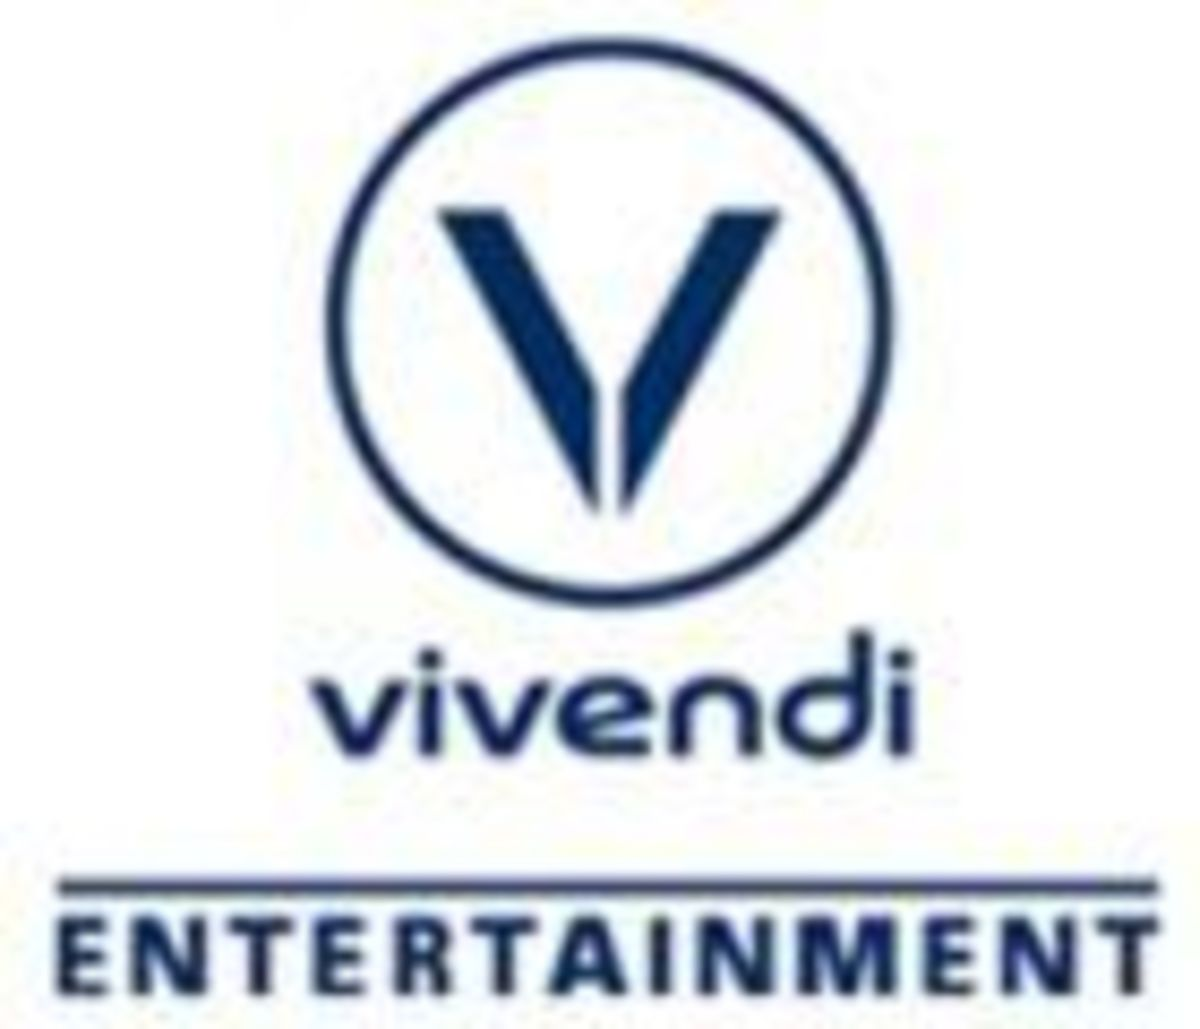 Vivendi Entertainment Logo